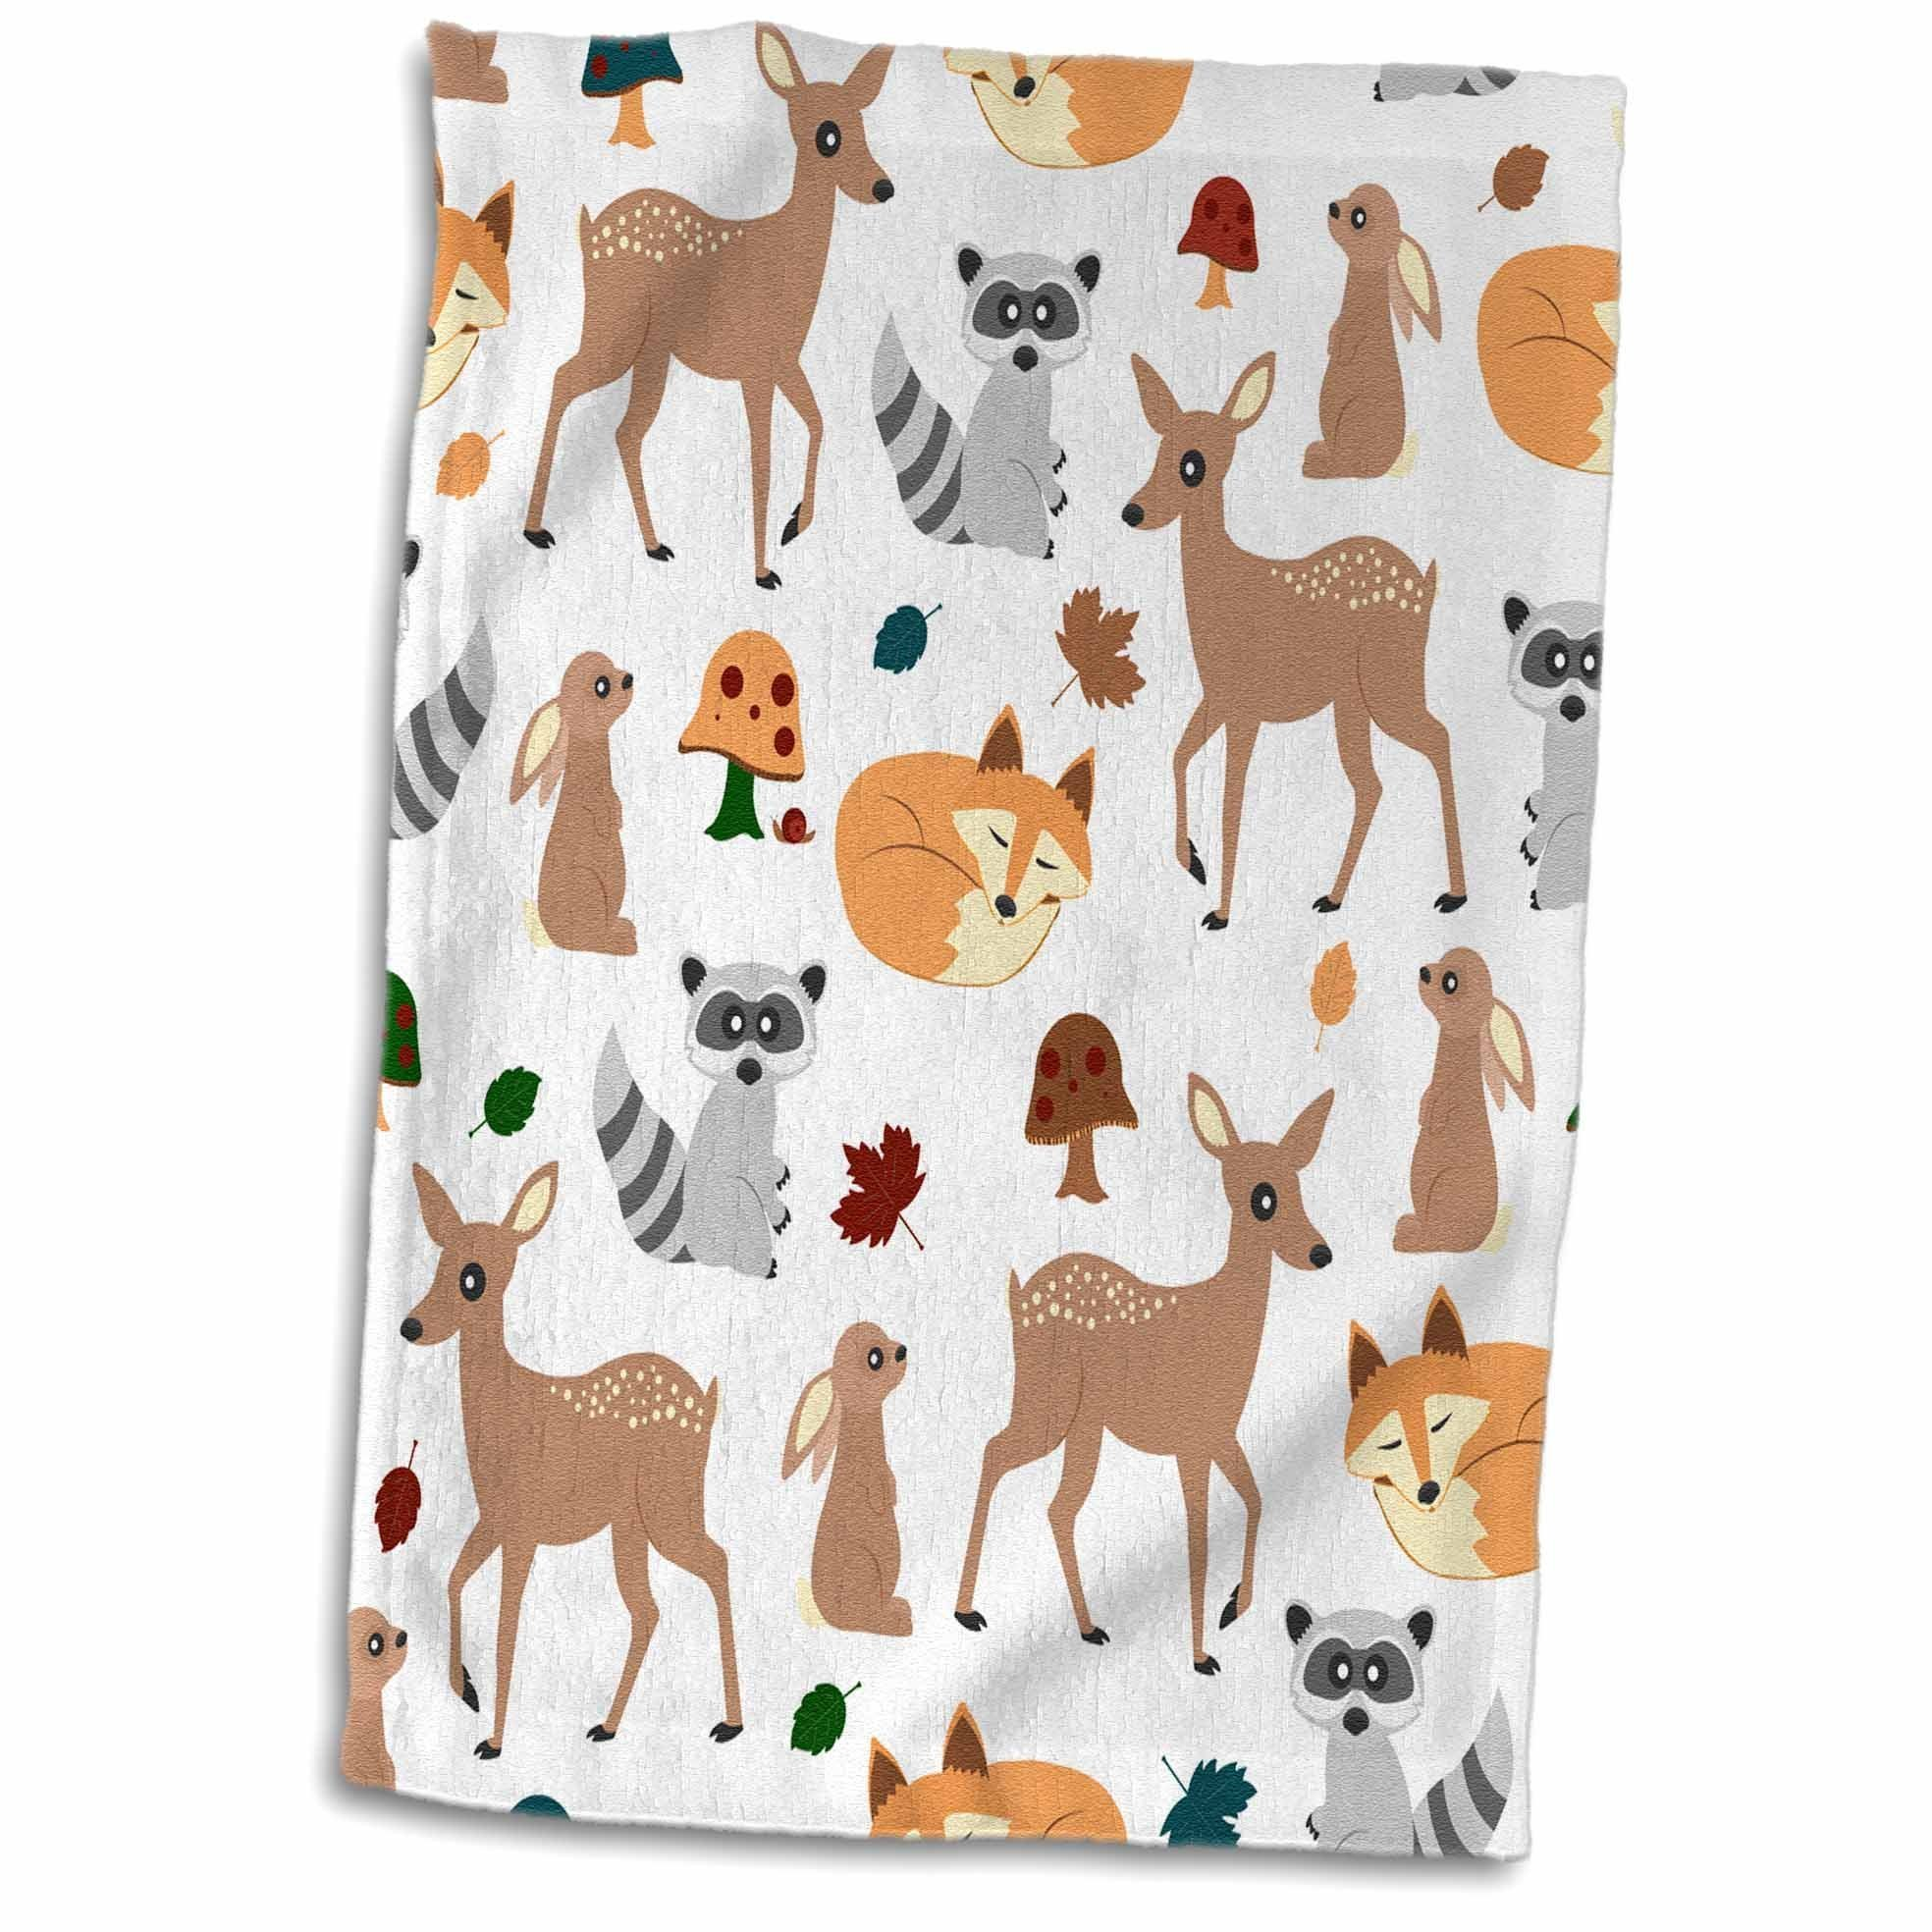 3D Rose Woodland Animals Pattern-Fawn Fox Raccoon Rabbit Hand Towel, 15'' x 22''